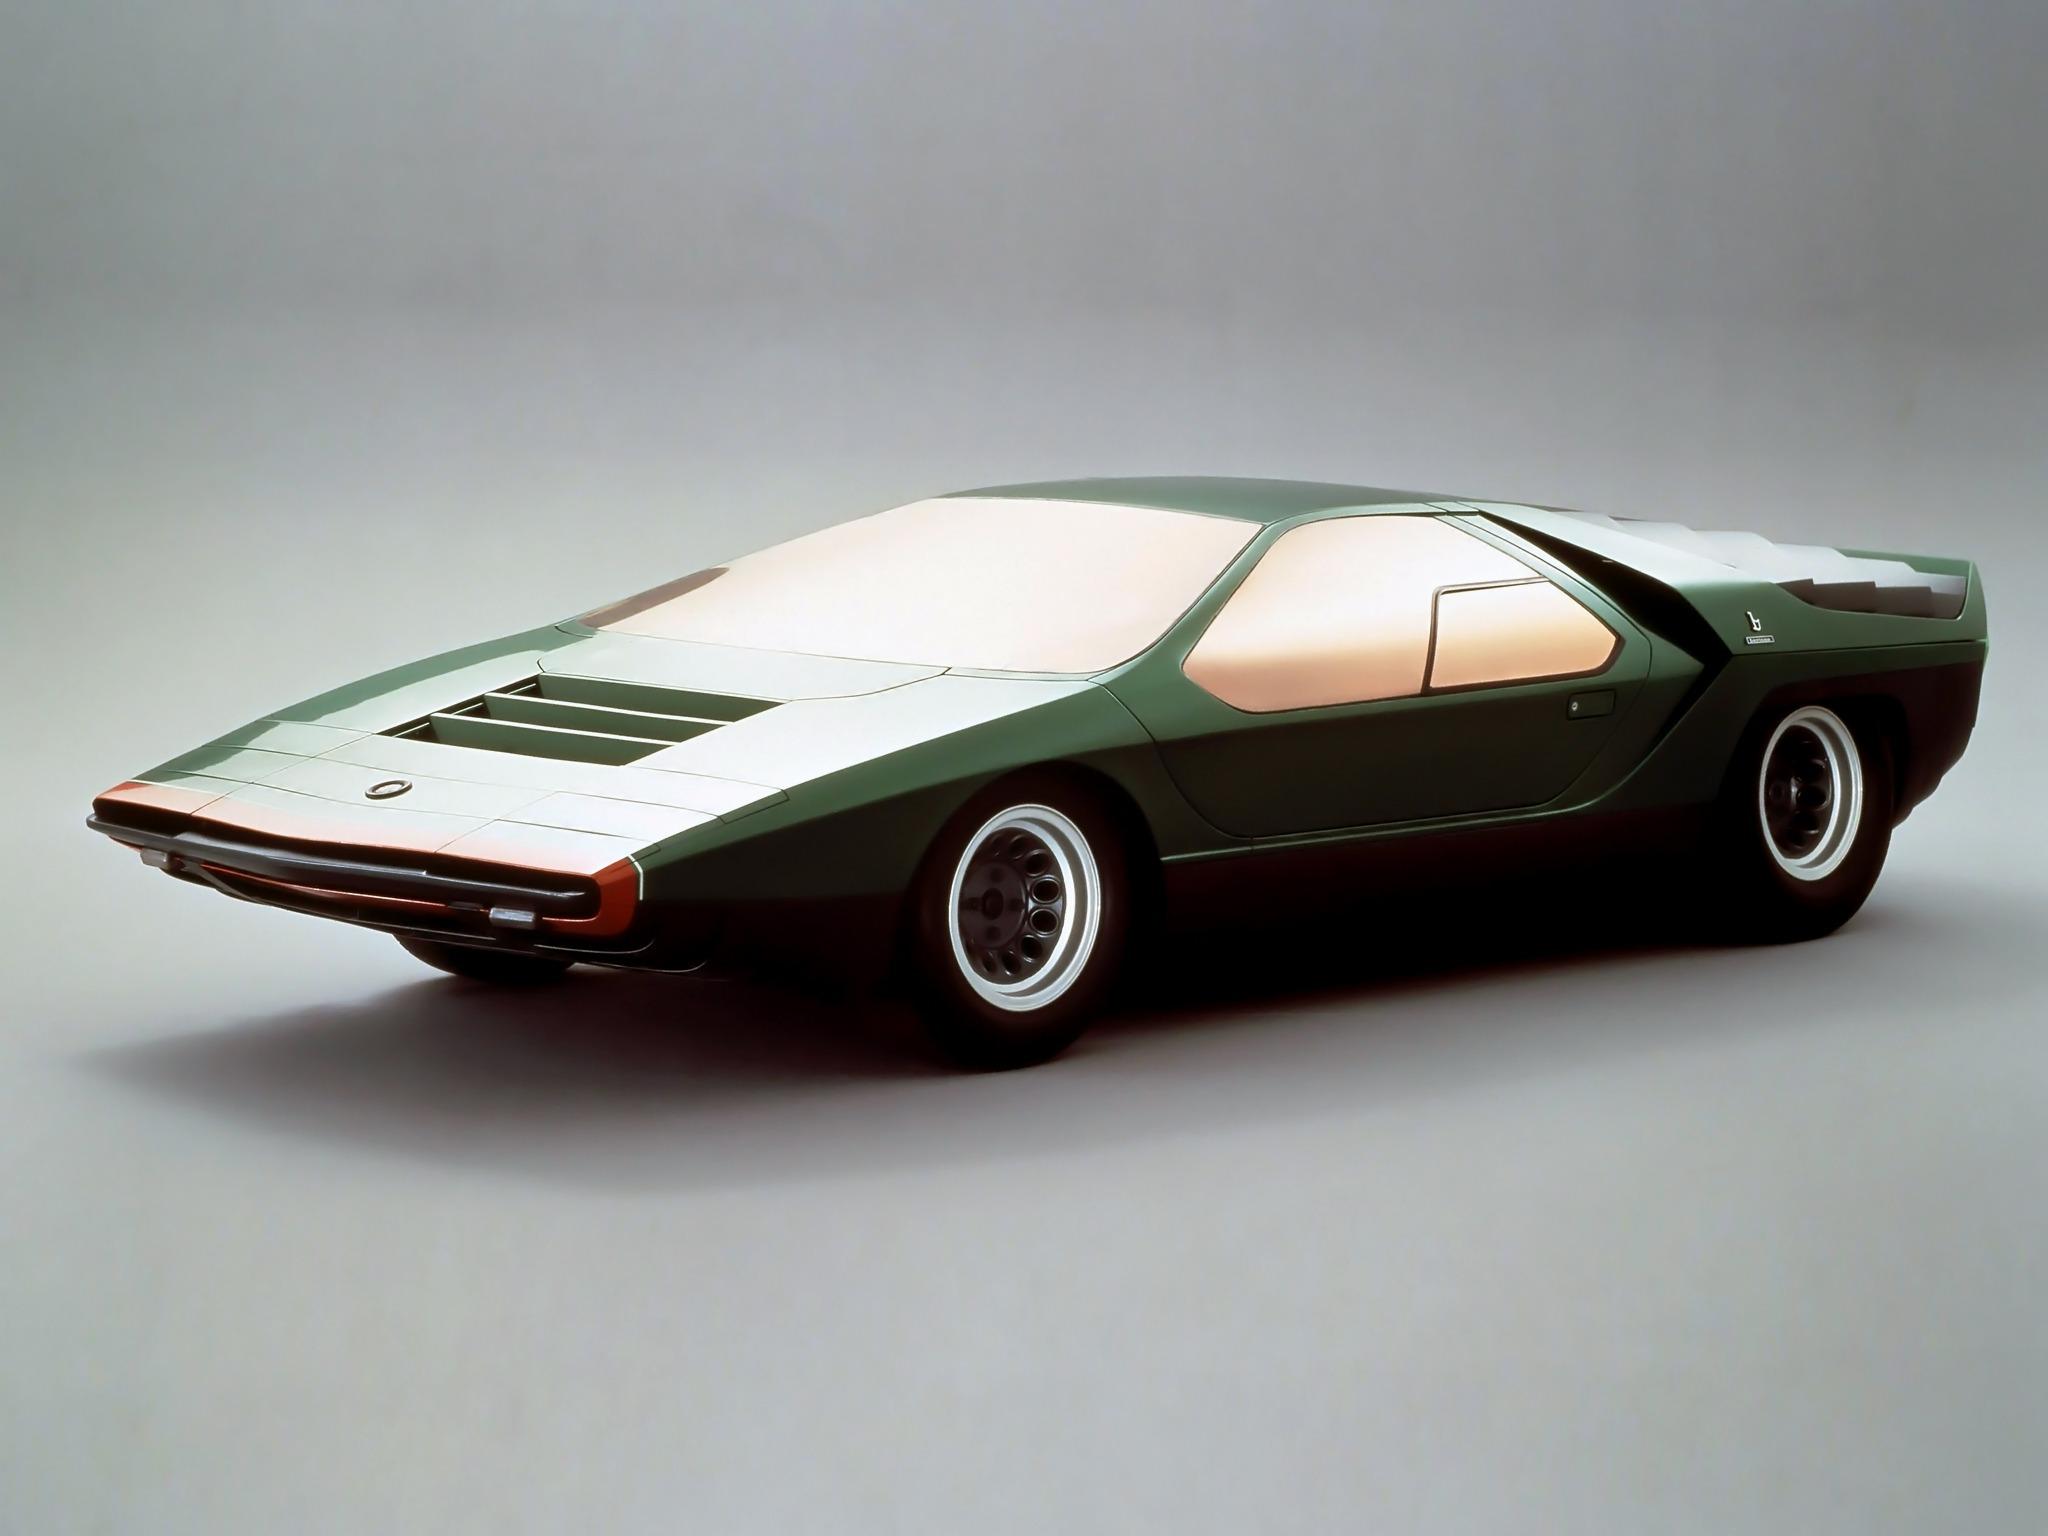 alfa romeo carabo 1968 old concept cars. Black Bedroom Furniture Sets. Home Design Ideas